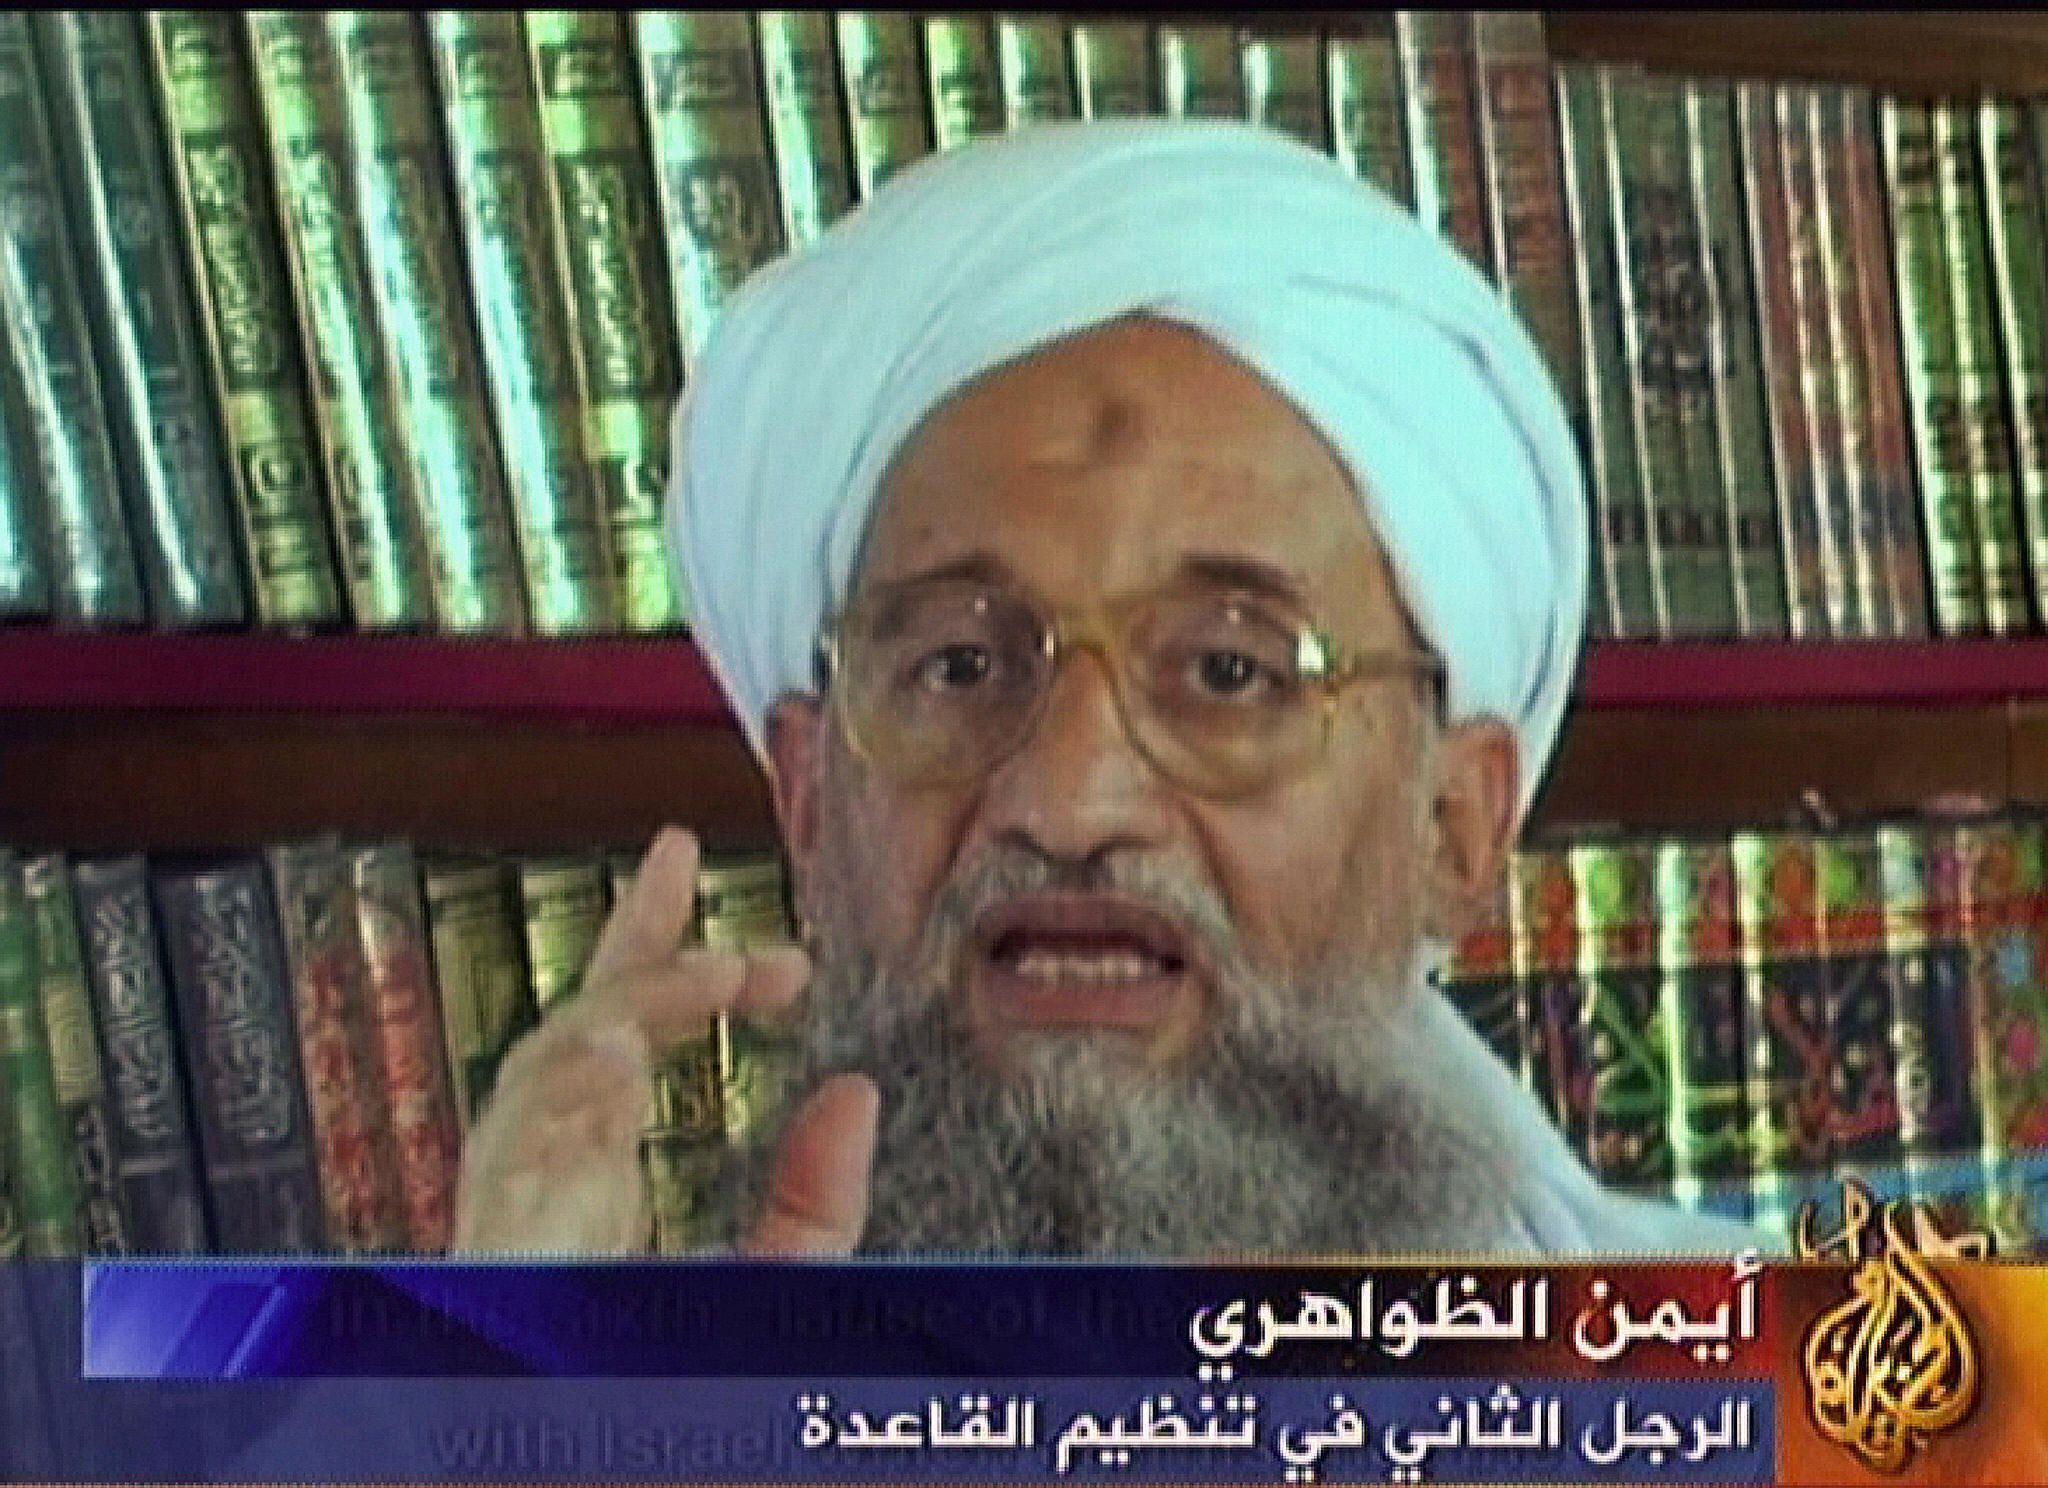 0114_Ayman_al_Zawahri